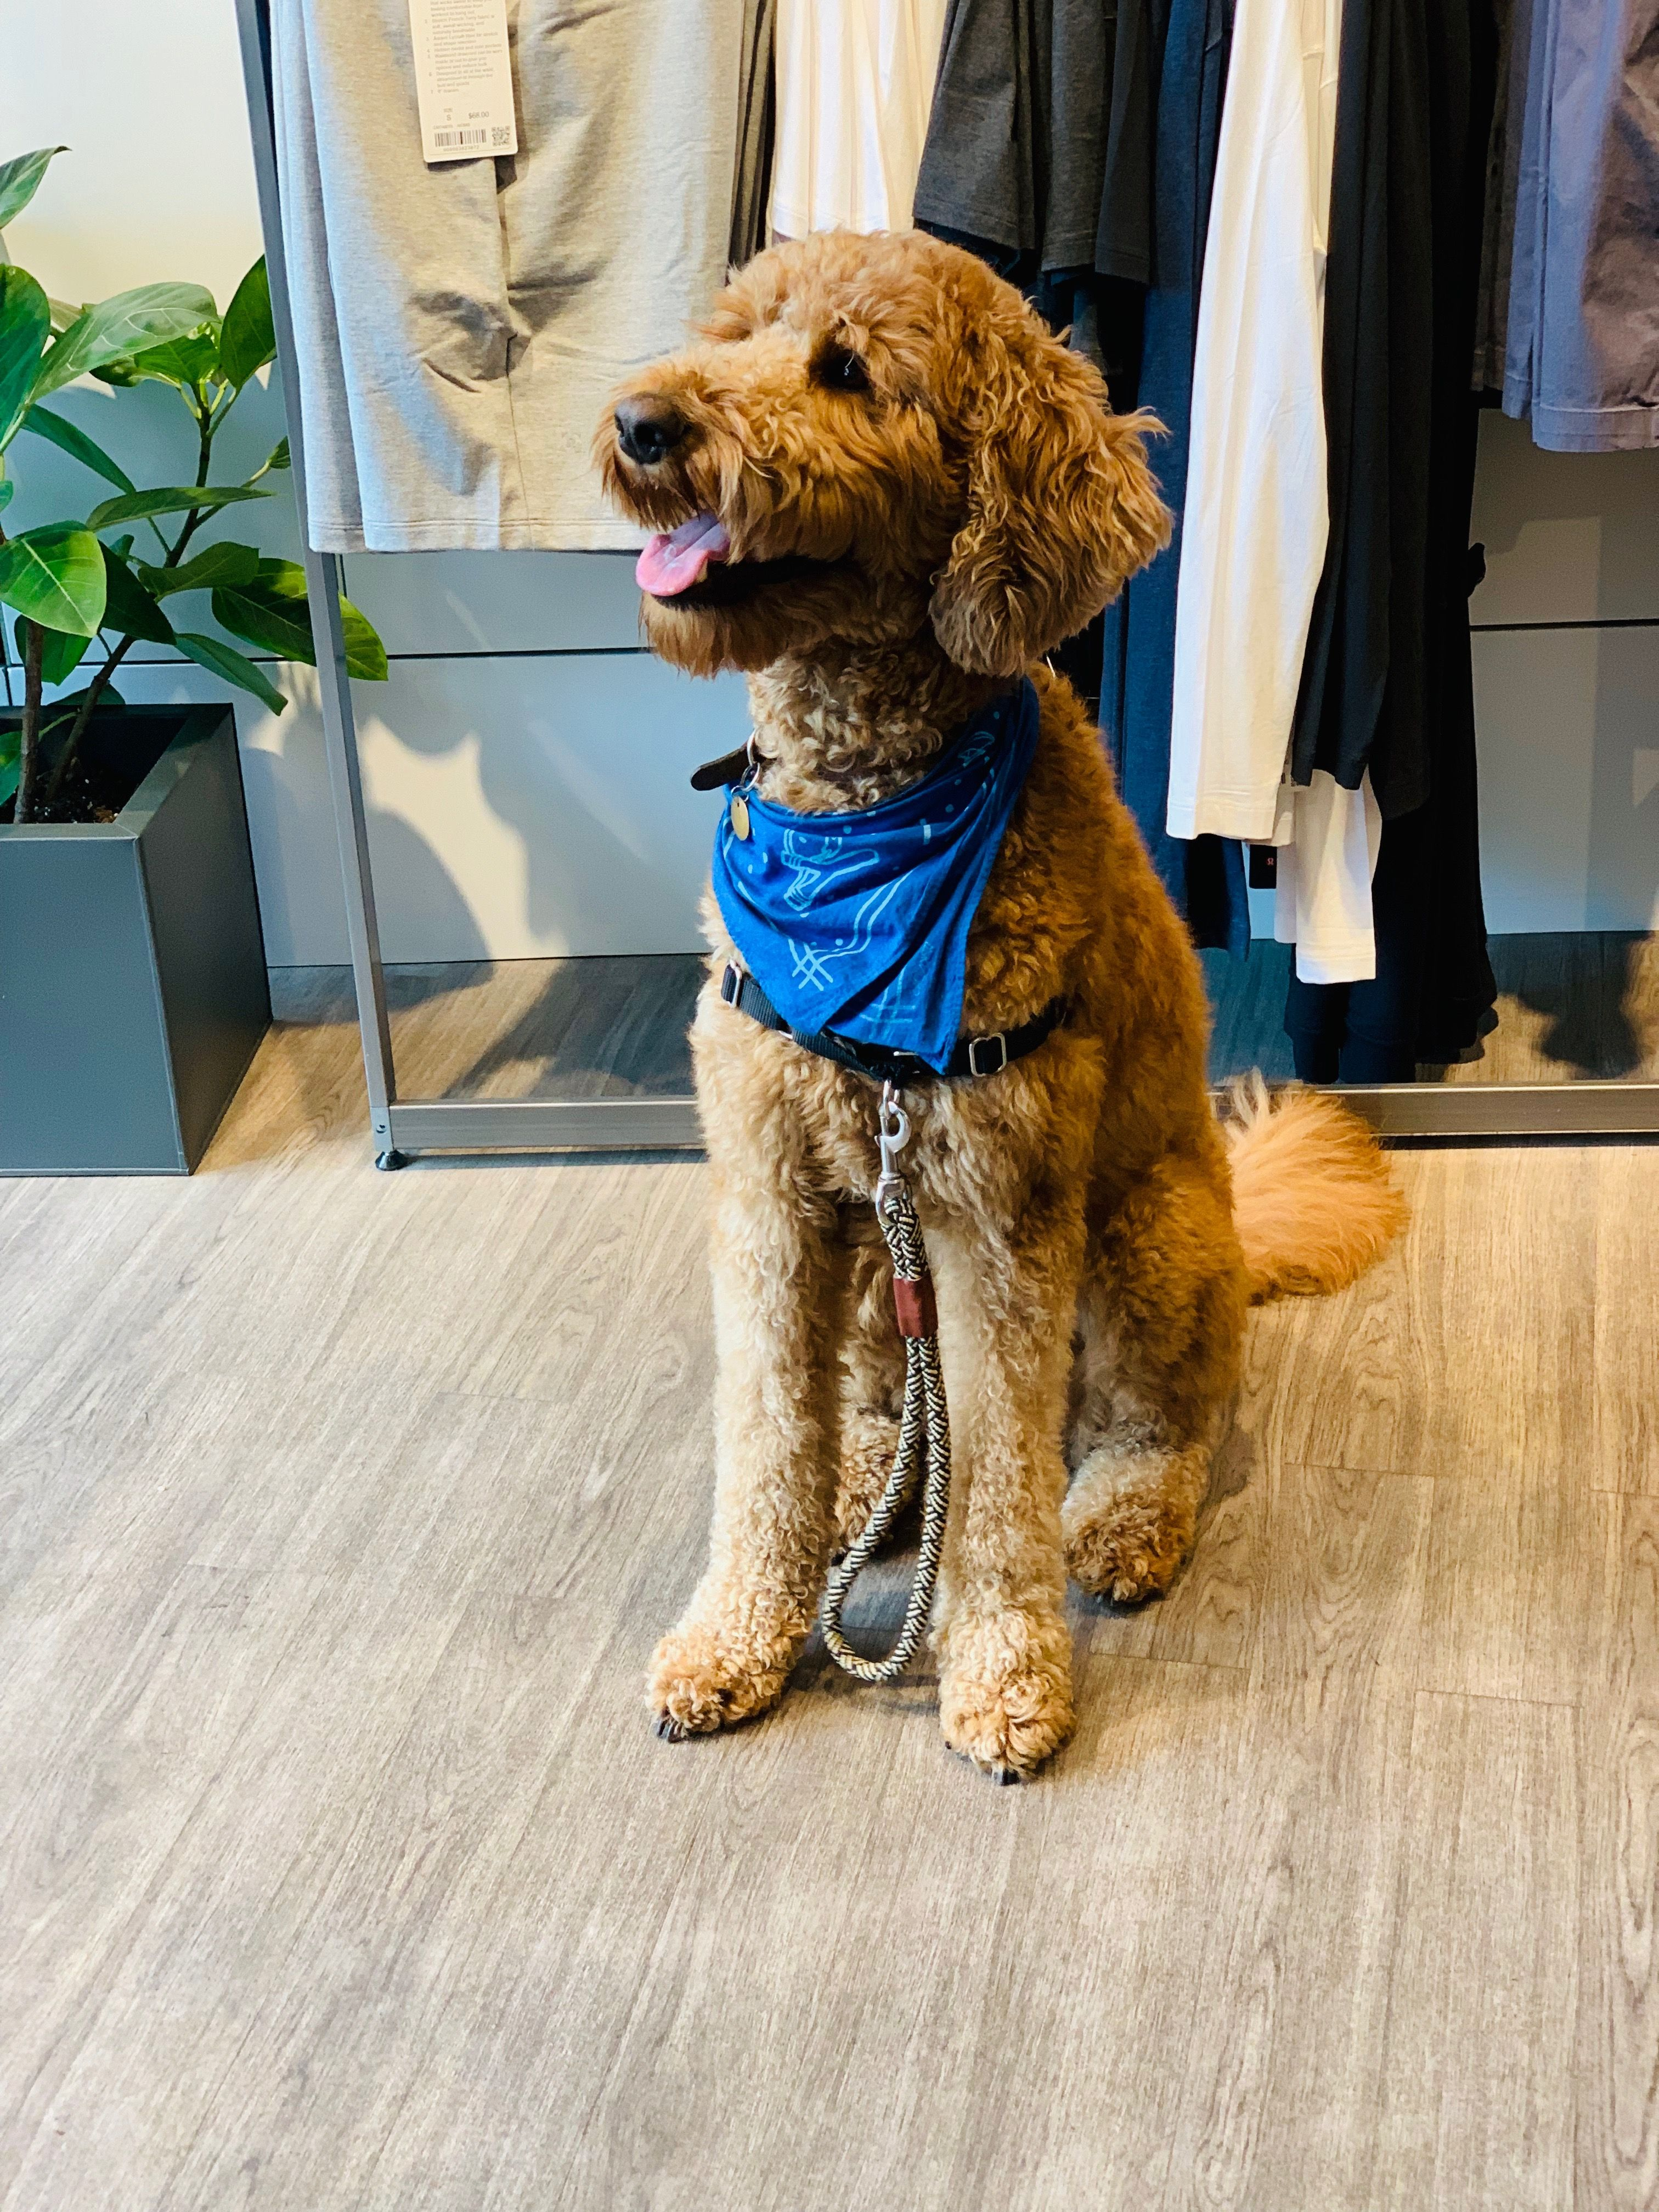 Black Tan Dog Shorti Line Leash Coast Brands Makes Stylish Dog Leashes Dog Collars And Dog Harnesses Made Out O Dog Harness Handmade Dog Leash Girl And Dog